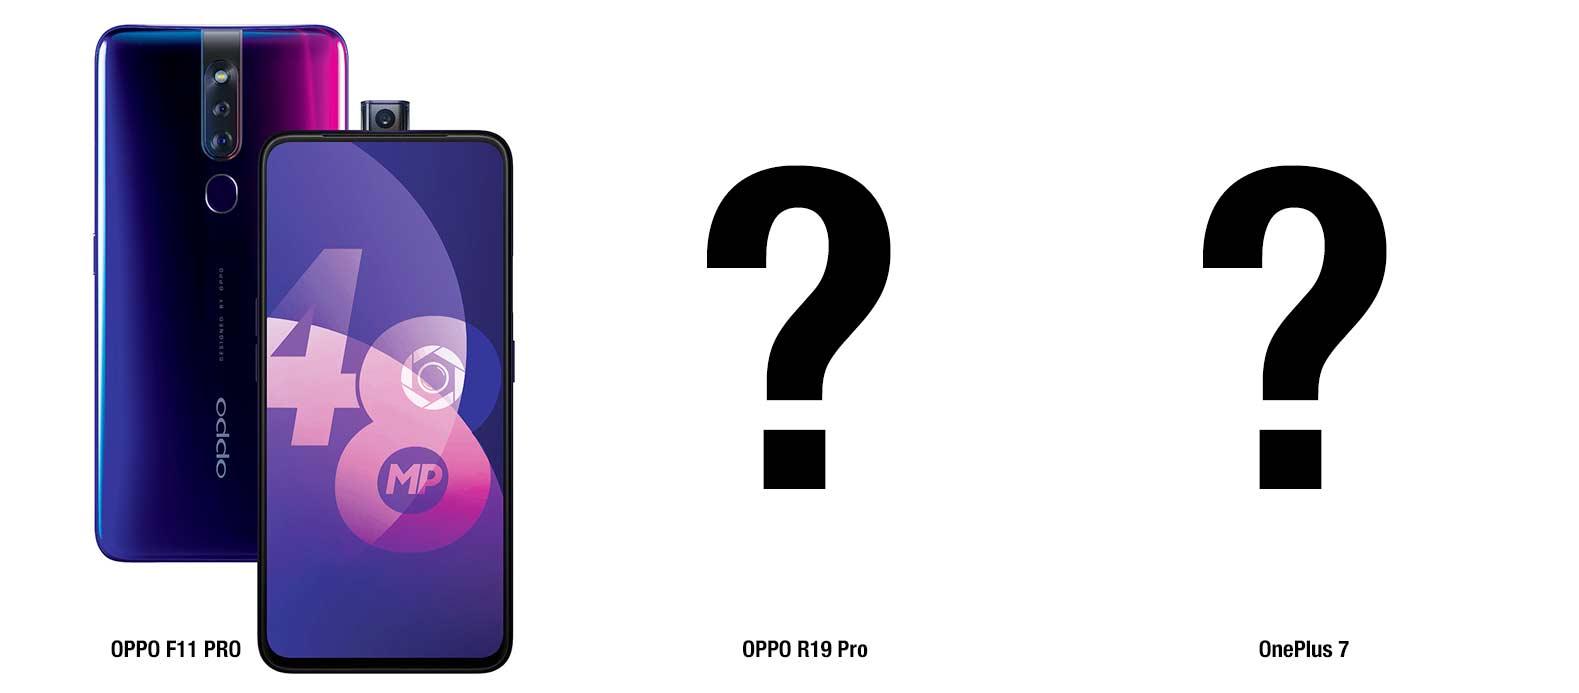 How OPPO F11 Pro kinda sorta leaked OnePlus 7 - SlashGear